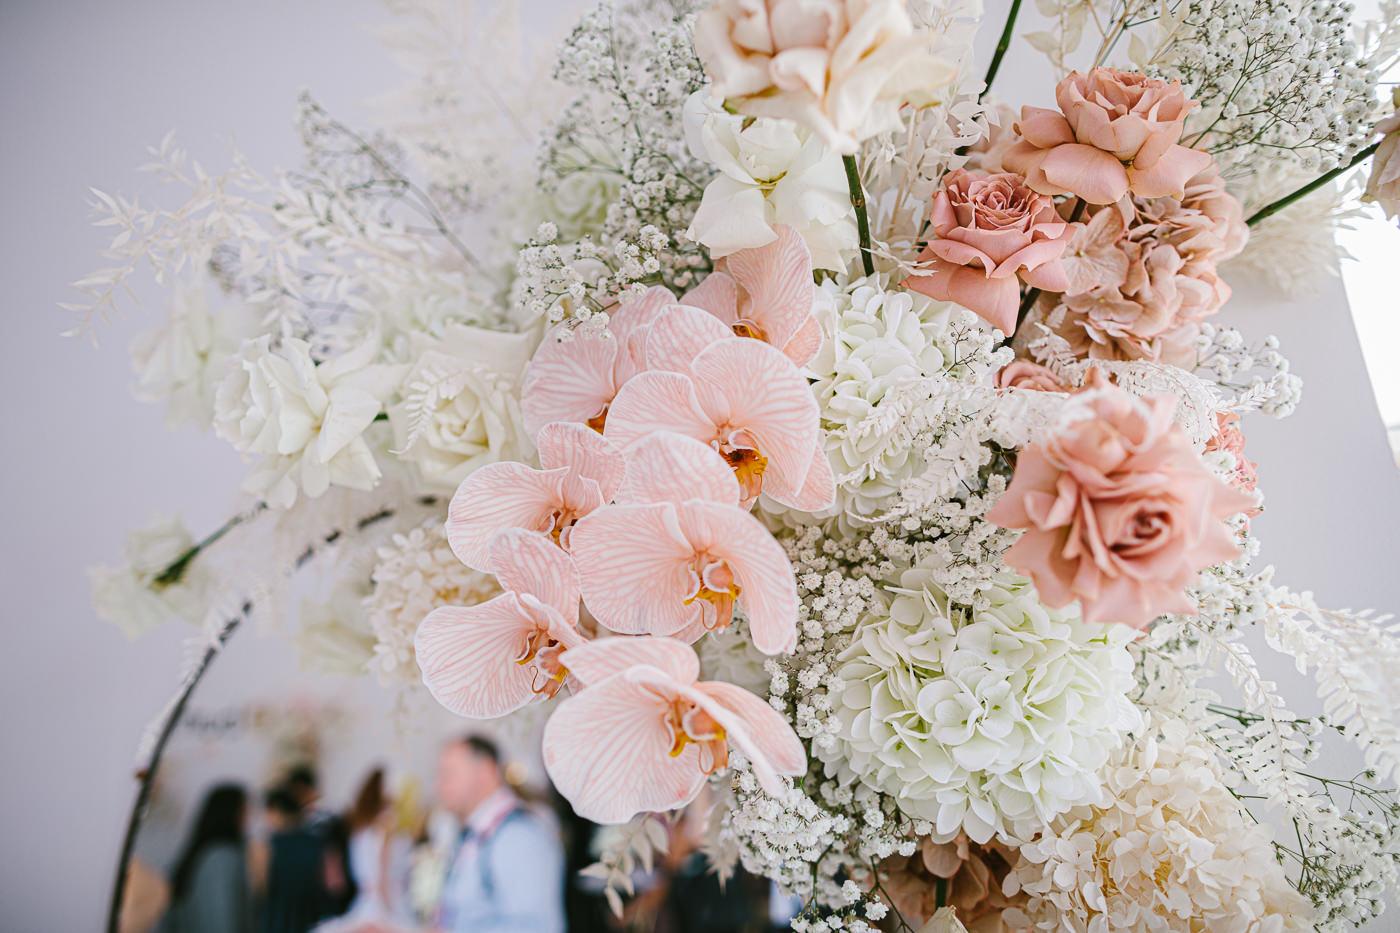 flower arrangements at event